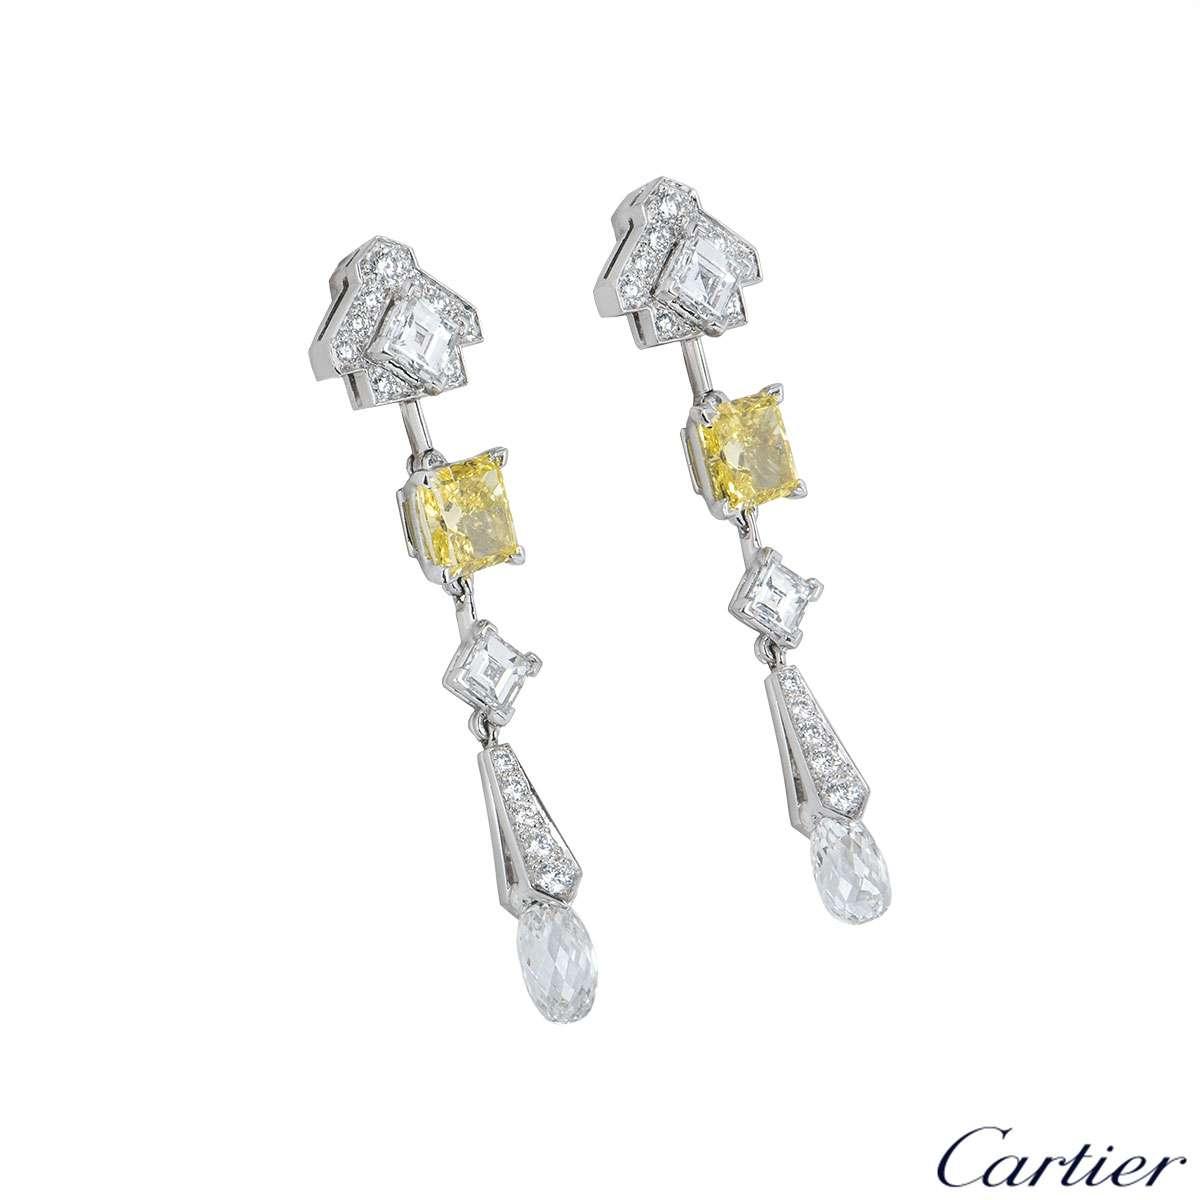 Cartier Platinum Mousseline Diamond Earrings